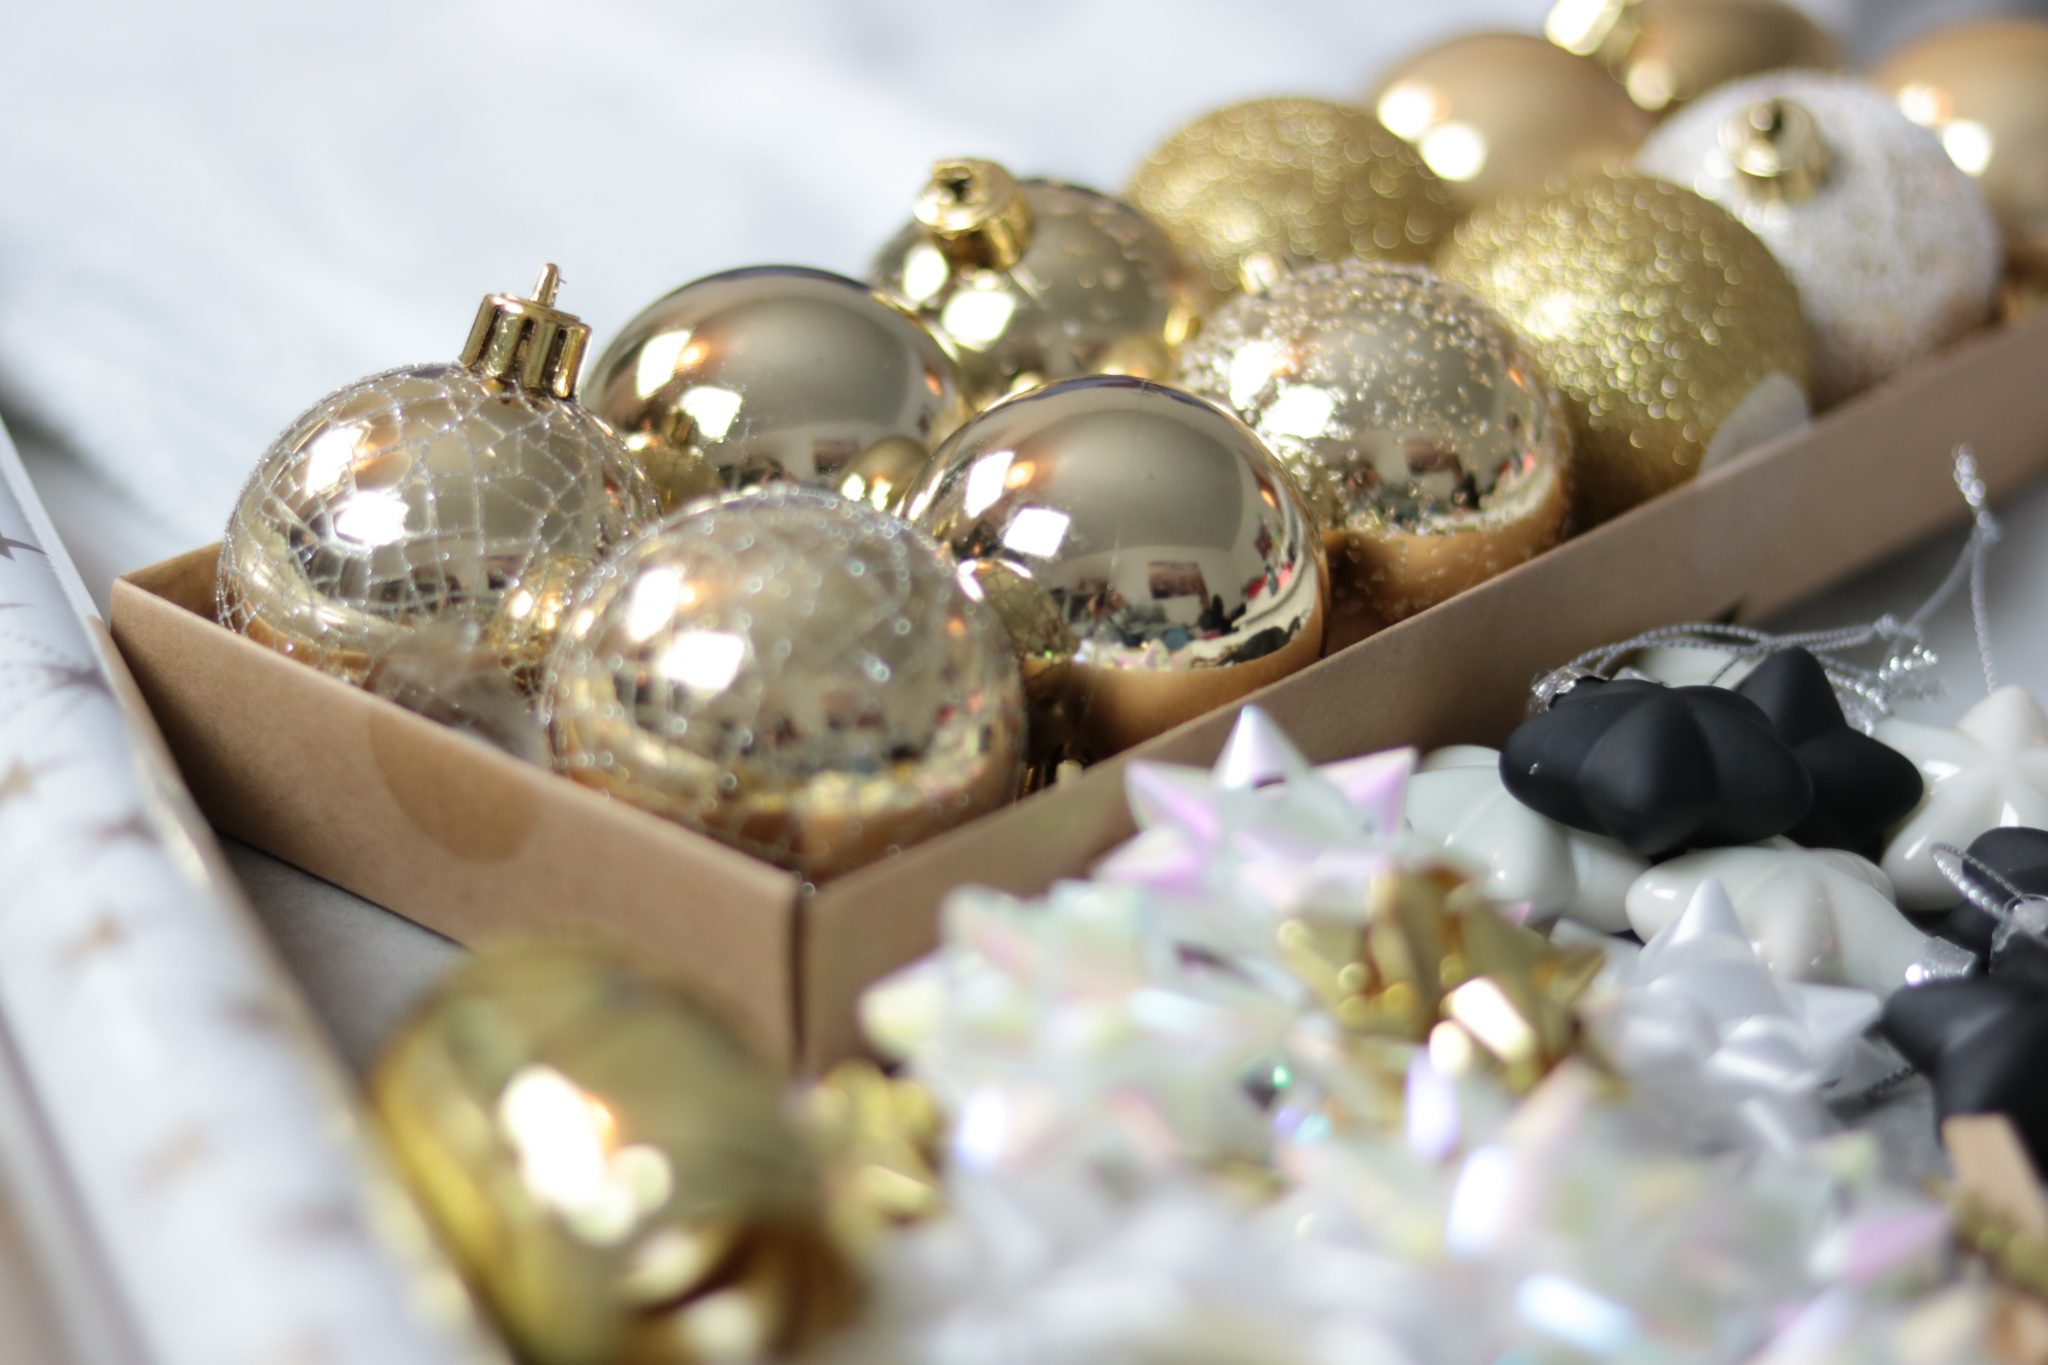 geschenke-besonders-verpacken-originell-adventskalender